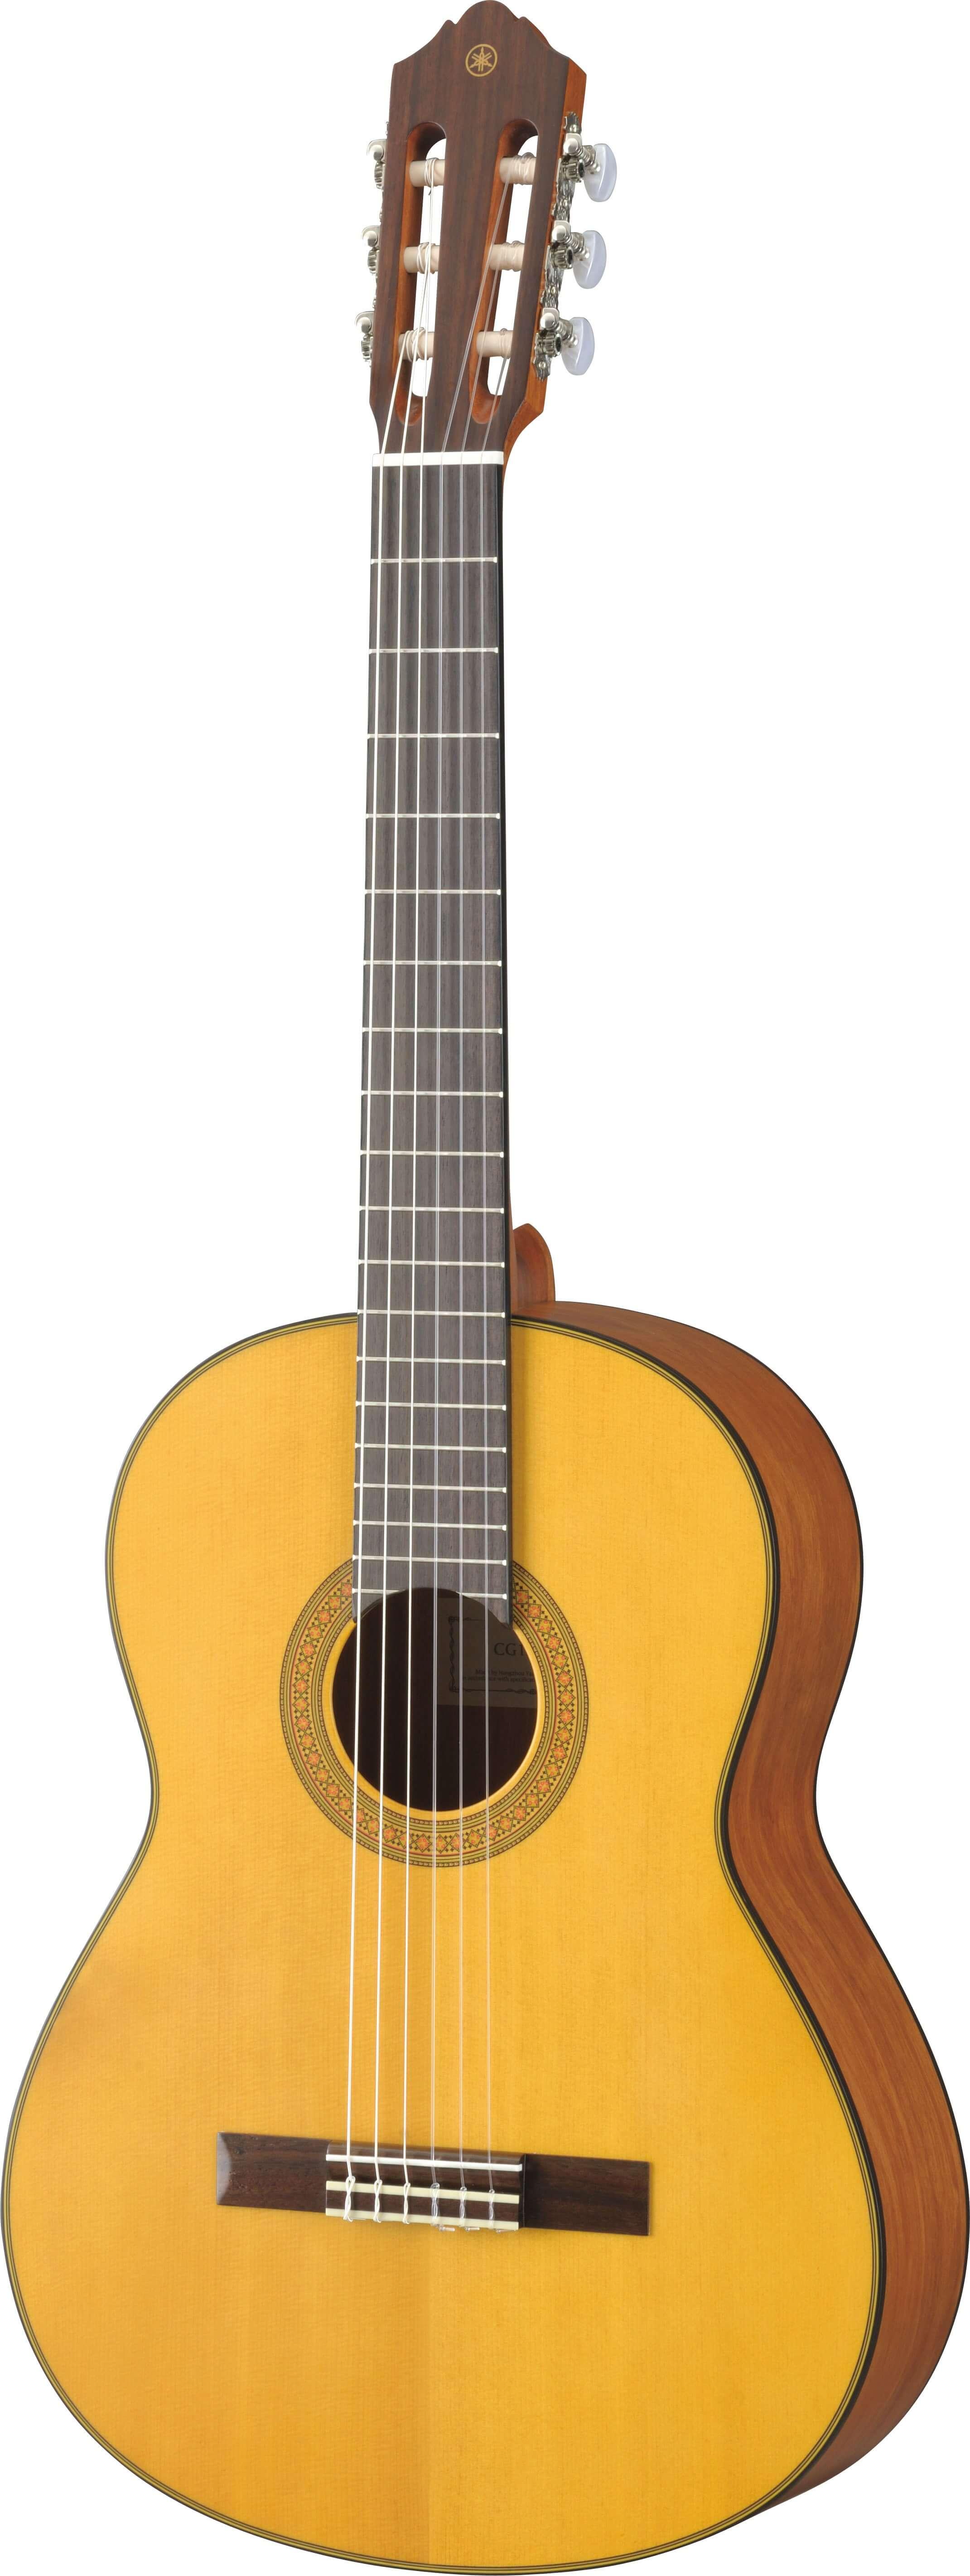 Guitarra Clásica Yamaha CG122MS Abeto